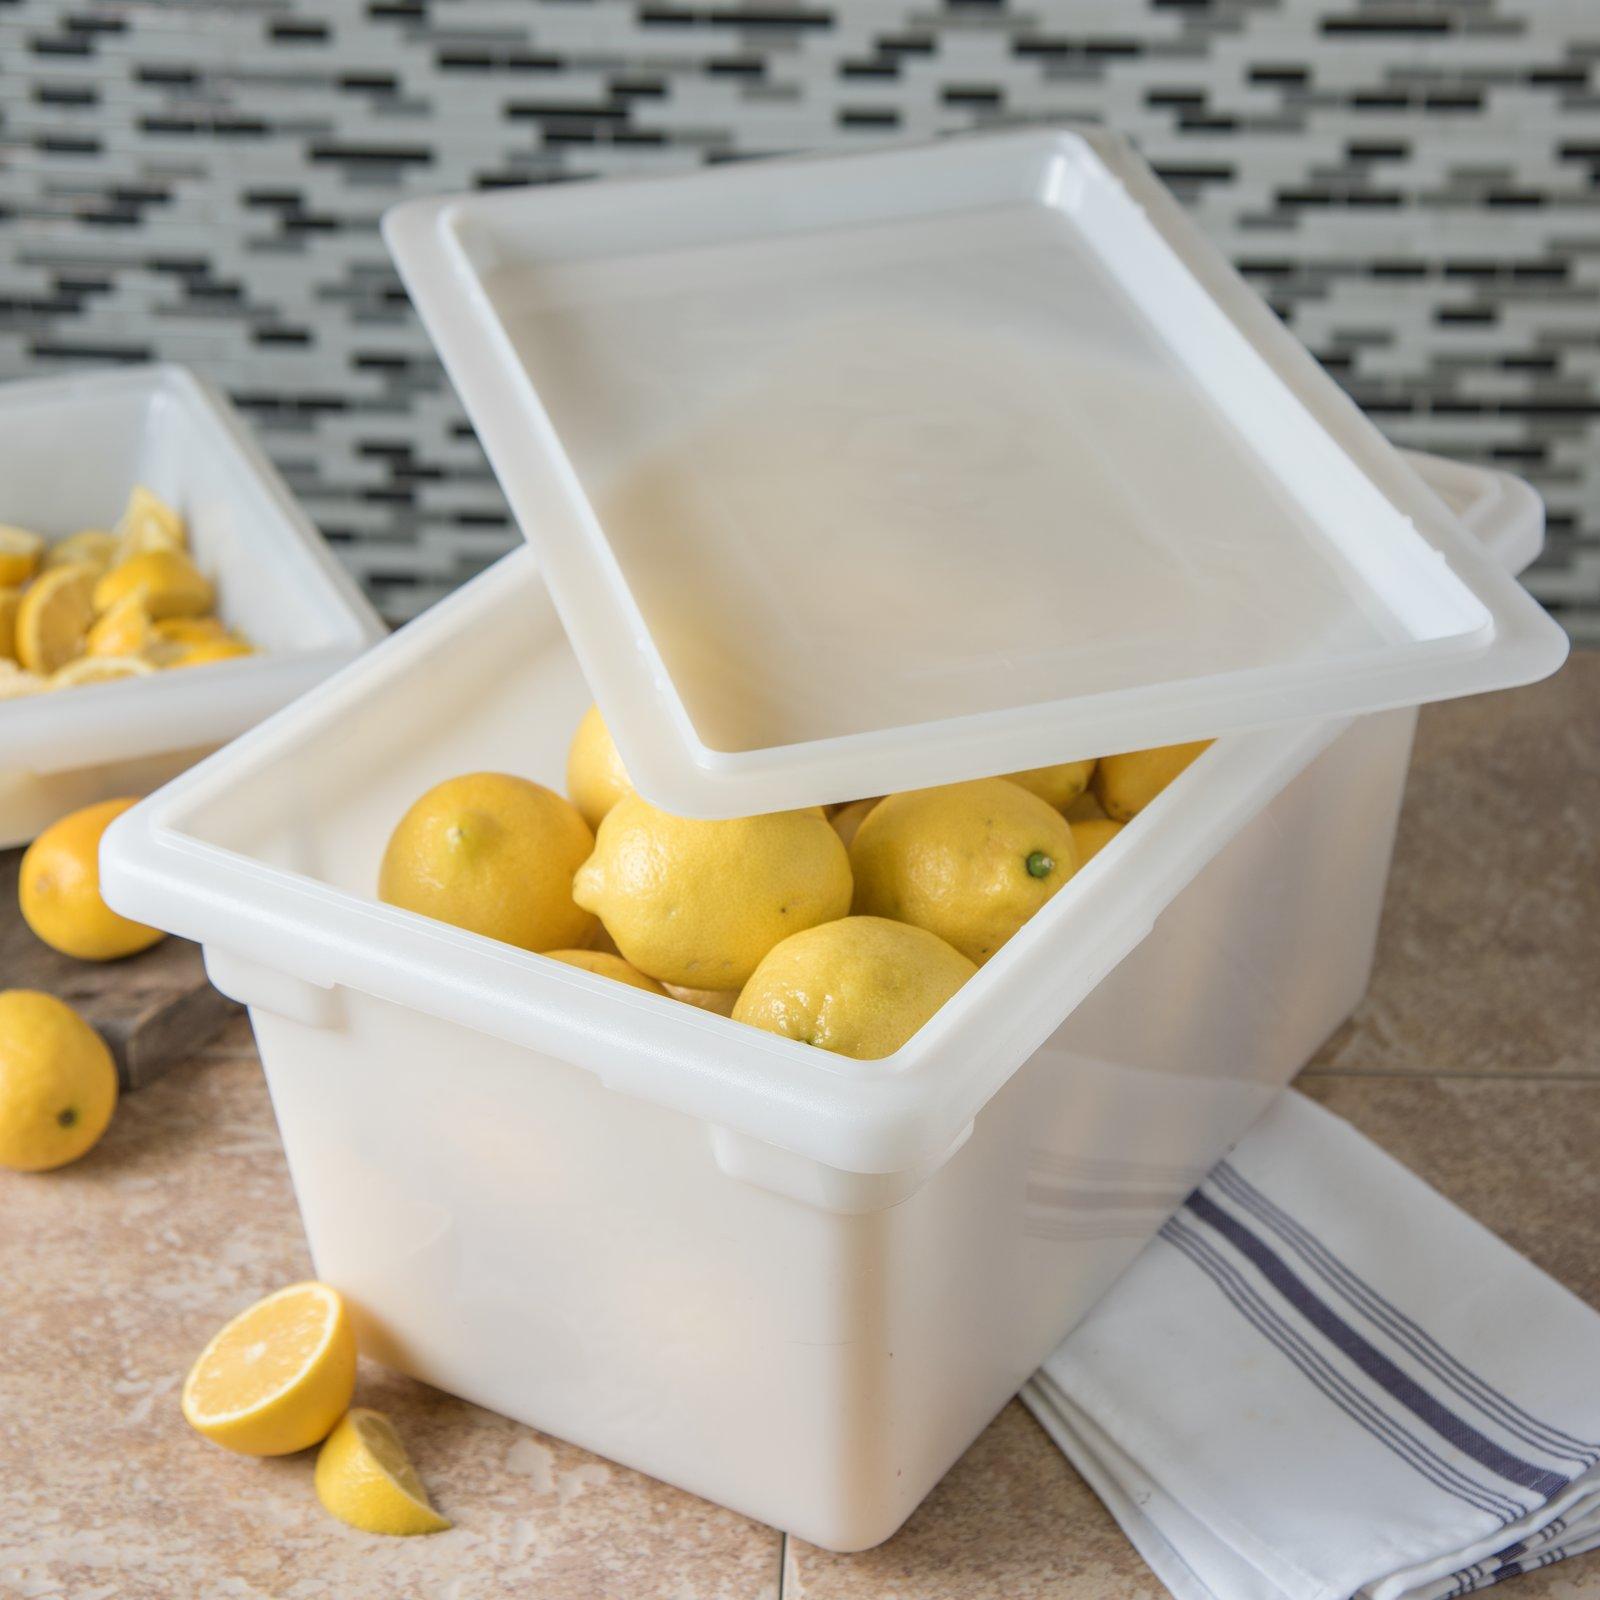 1063202 - StorPlus™ Polyethylene Food Box Storage Container 5 Gallon 18  x 12 & 1063202 - StorPlus™ Polyethylene Food Box Storage Container 5 Gallon ...